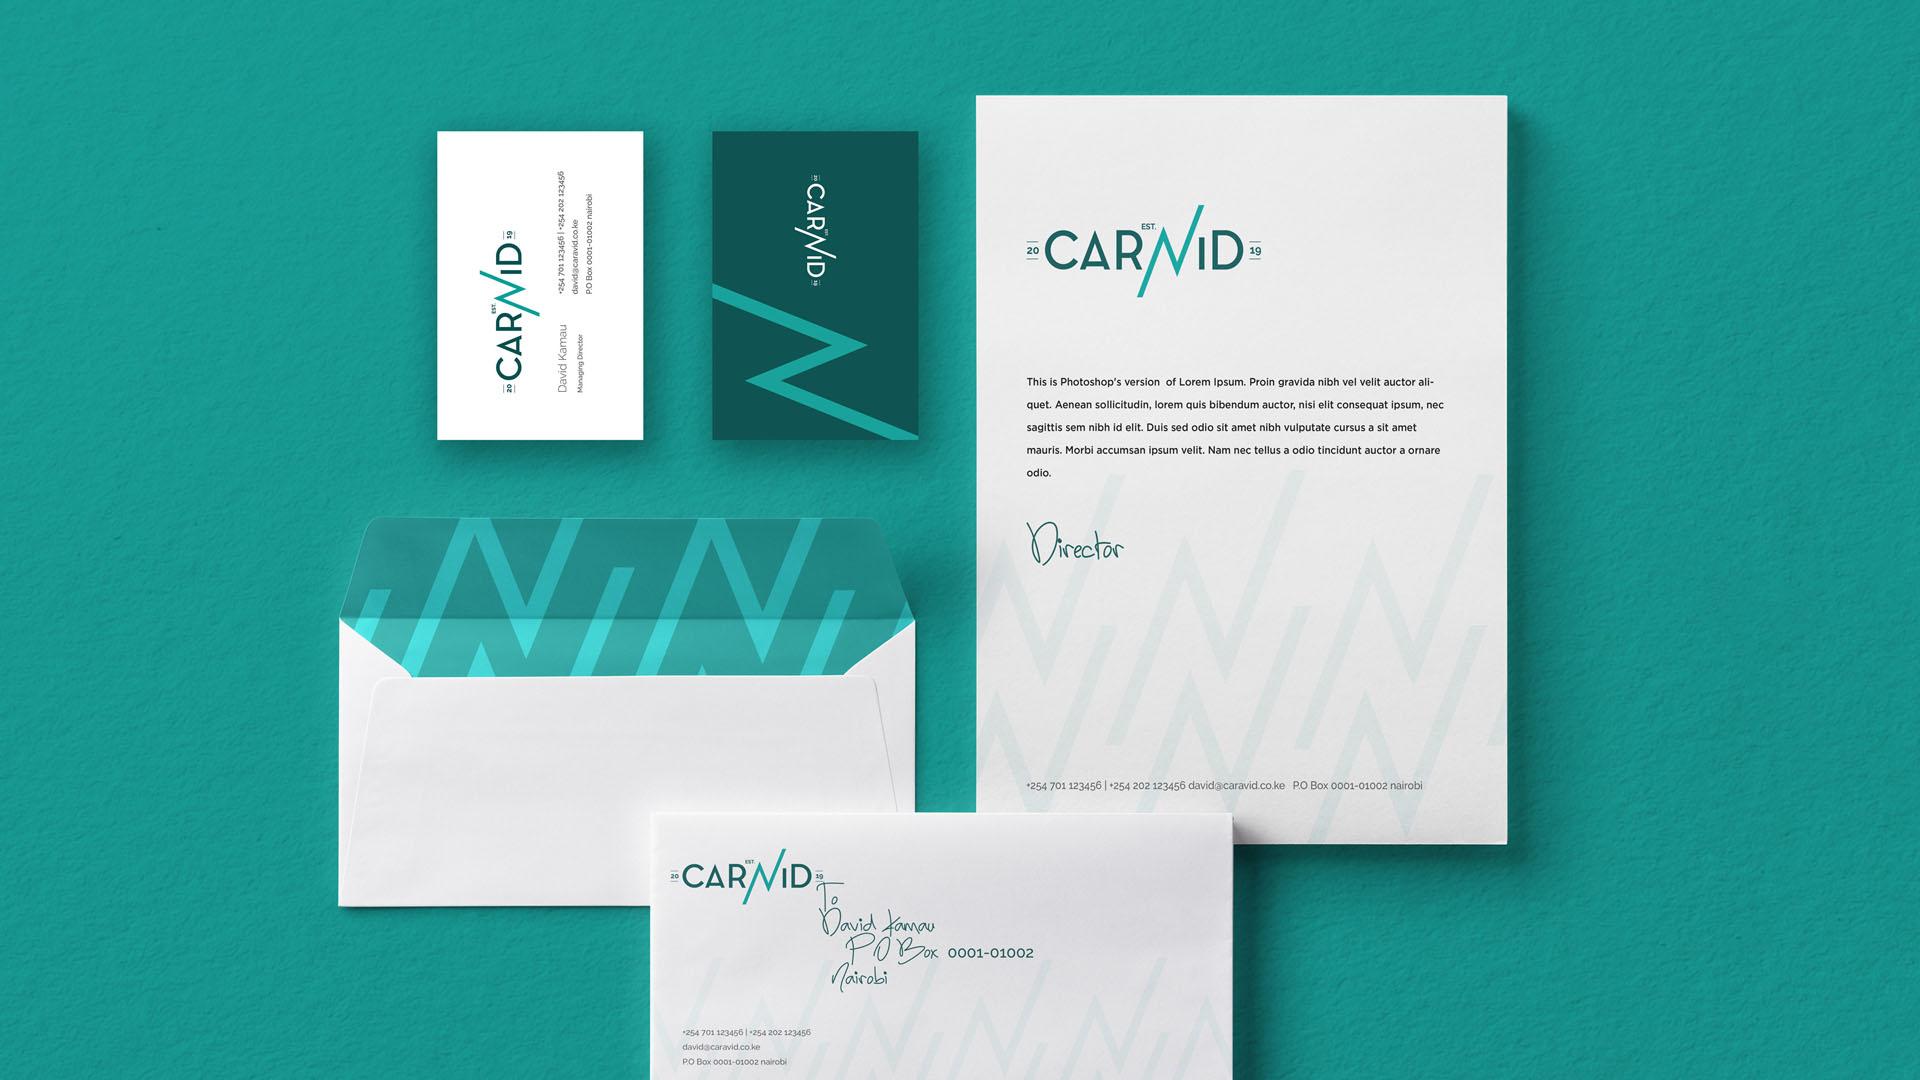 aravid-Envelop e Deigned by Jabari Creative Studios